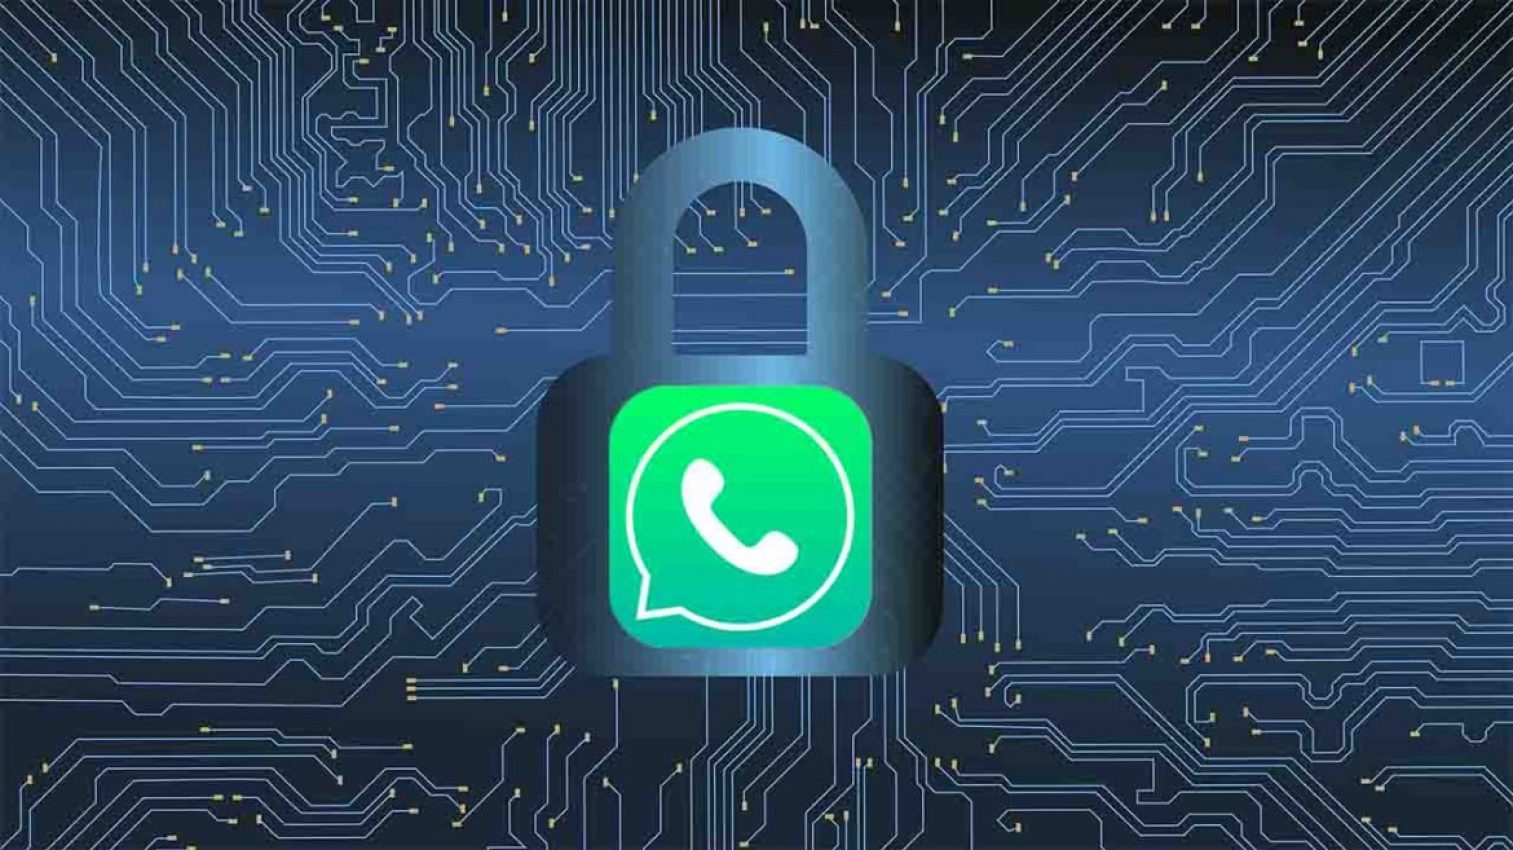 Whatsapp Securitate 1170x658